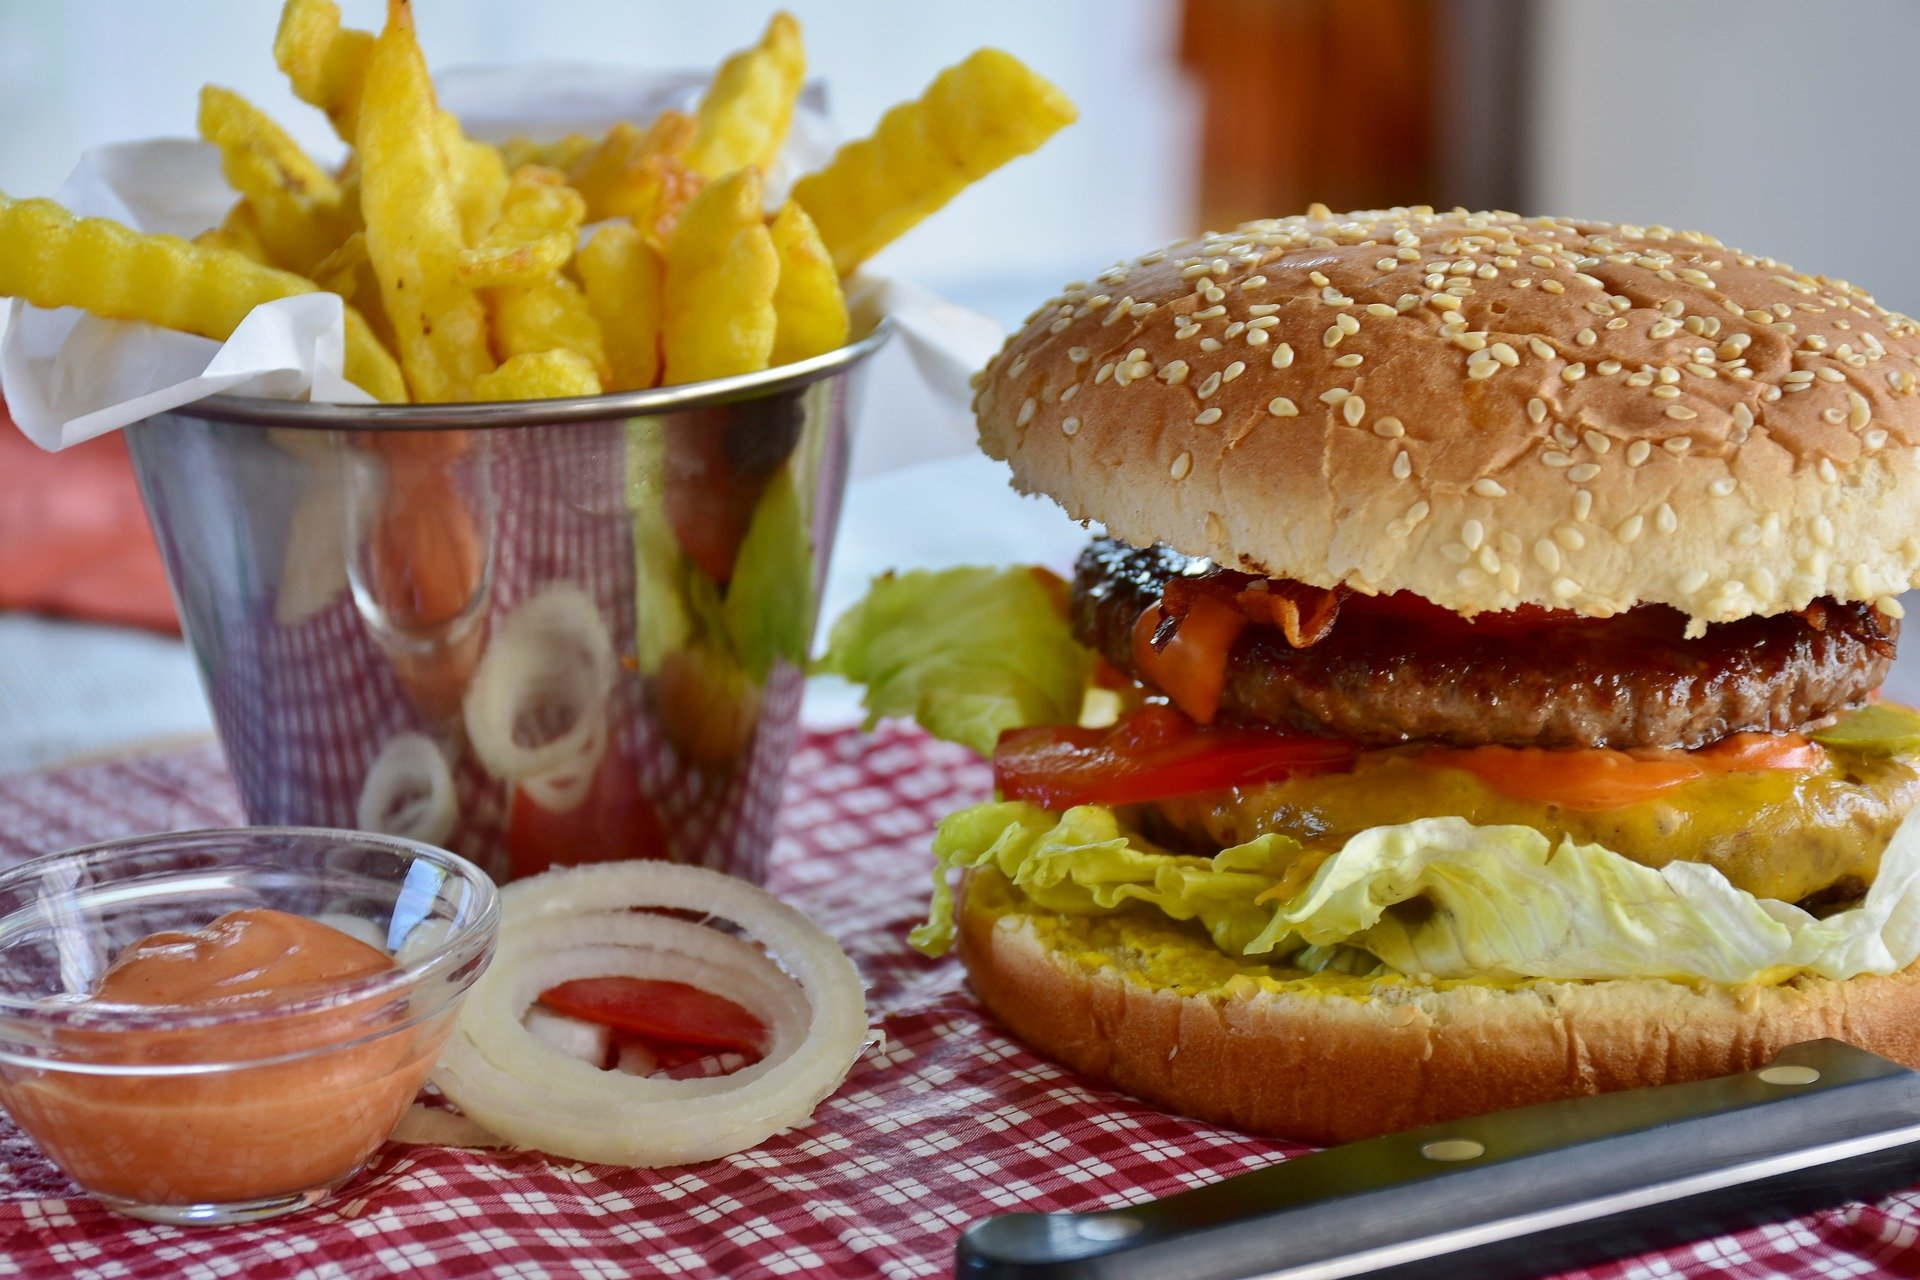 burger-3442227_1920.jpg